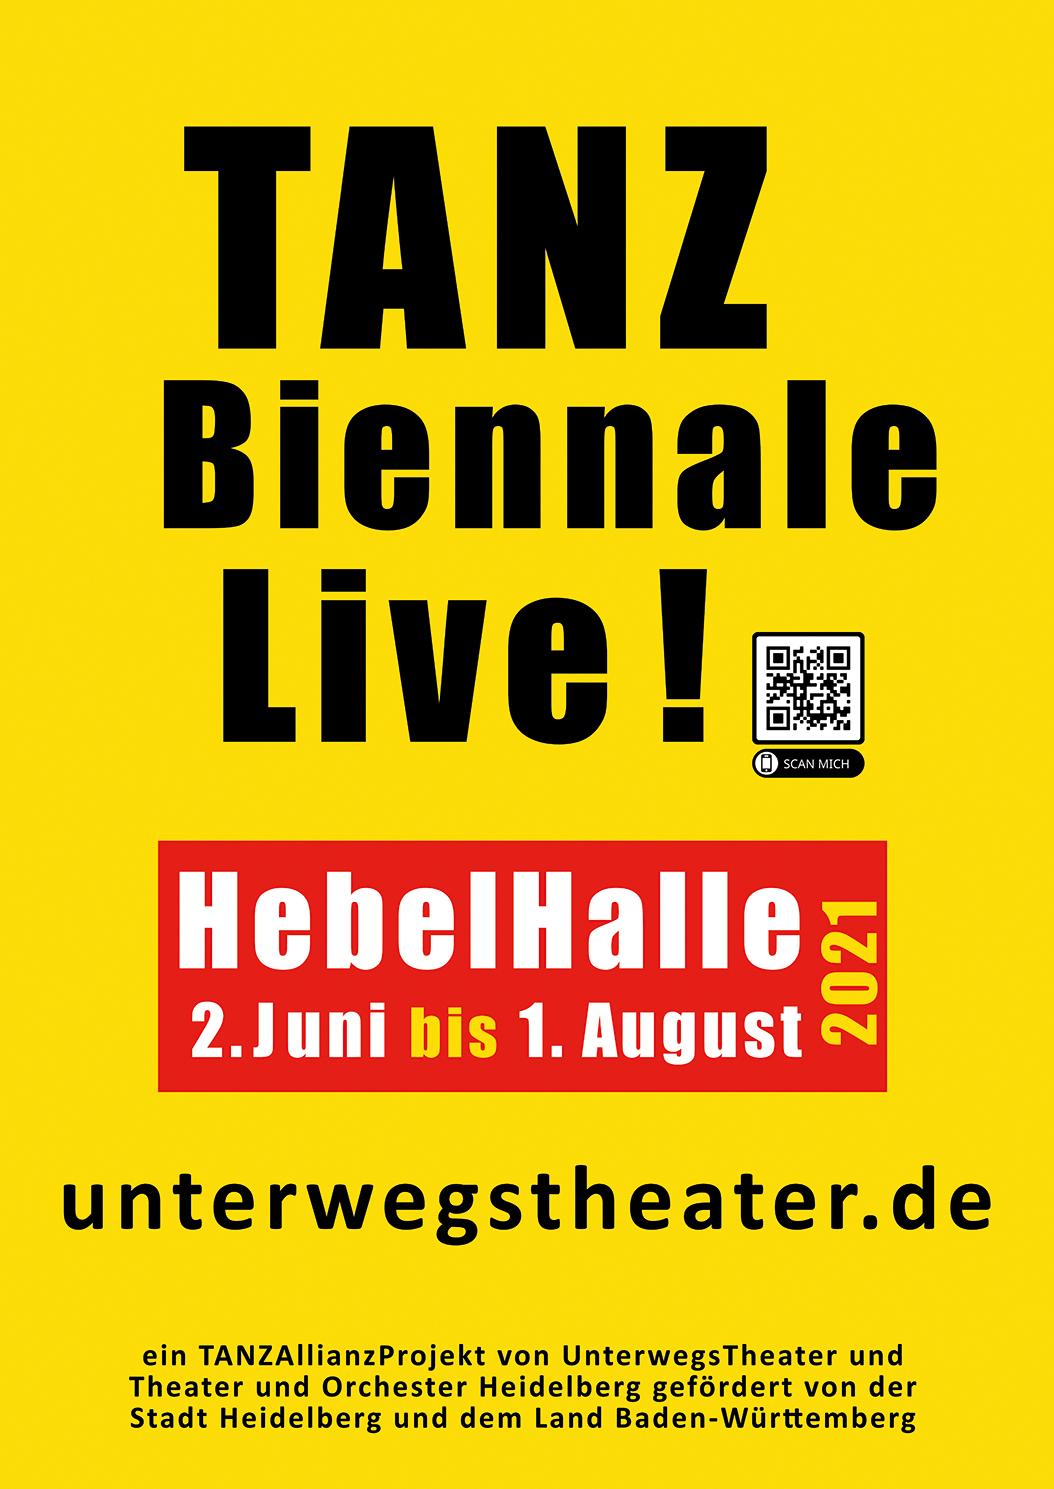 TANZBiennale Live_2021_A1_